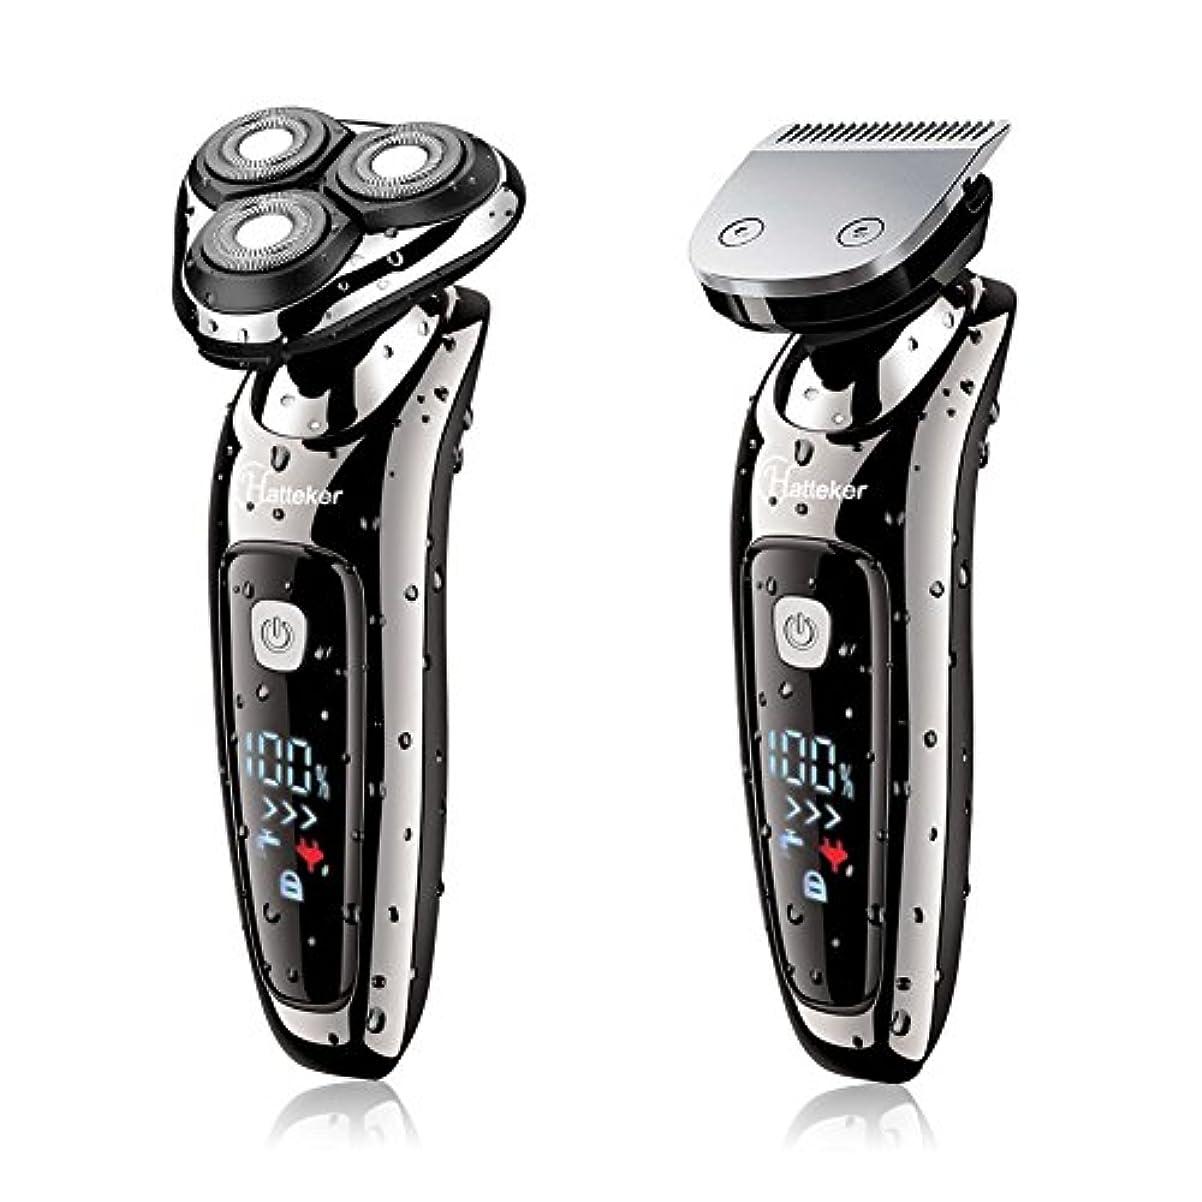 HATTEKER 電気シェーバー メンズ ひげ剃り充電式·交流式 バリカン/ヒゲ トリマーヘッド付き LEDディスプレイ 水洗いOK